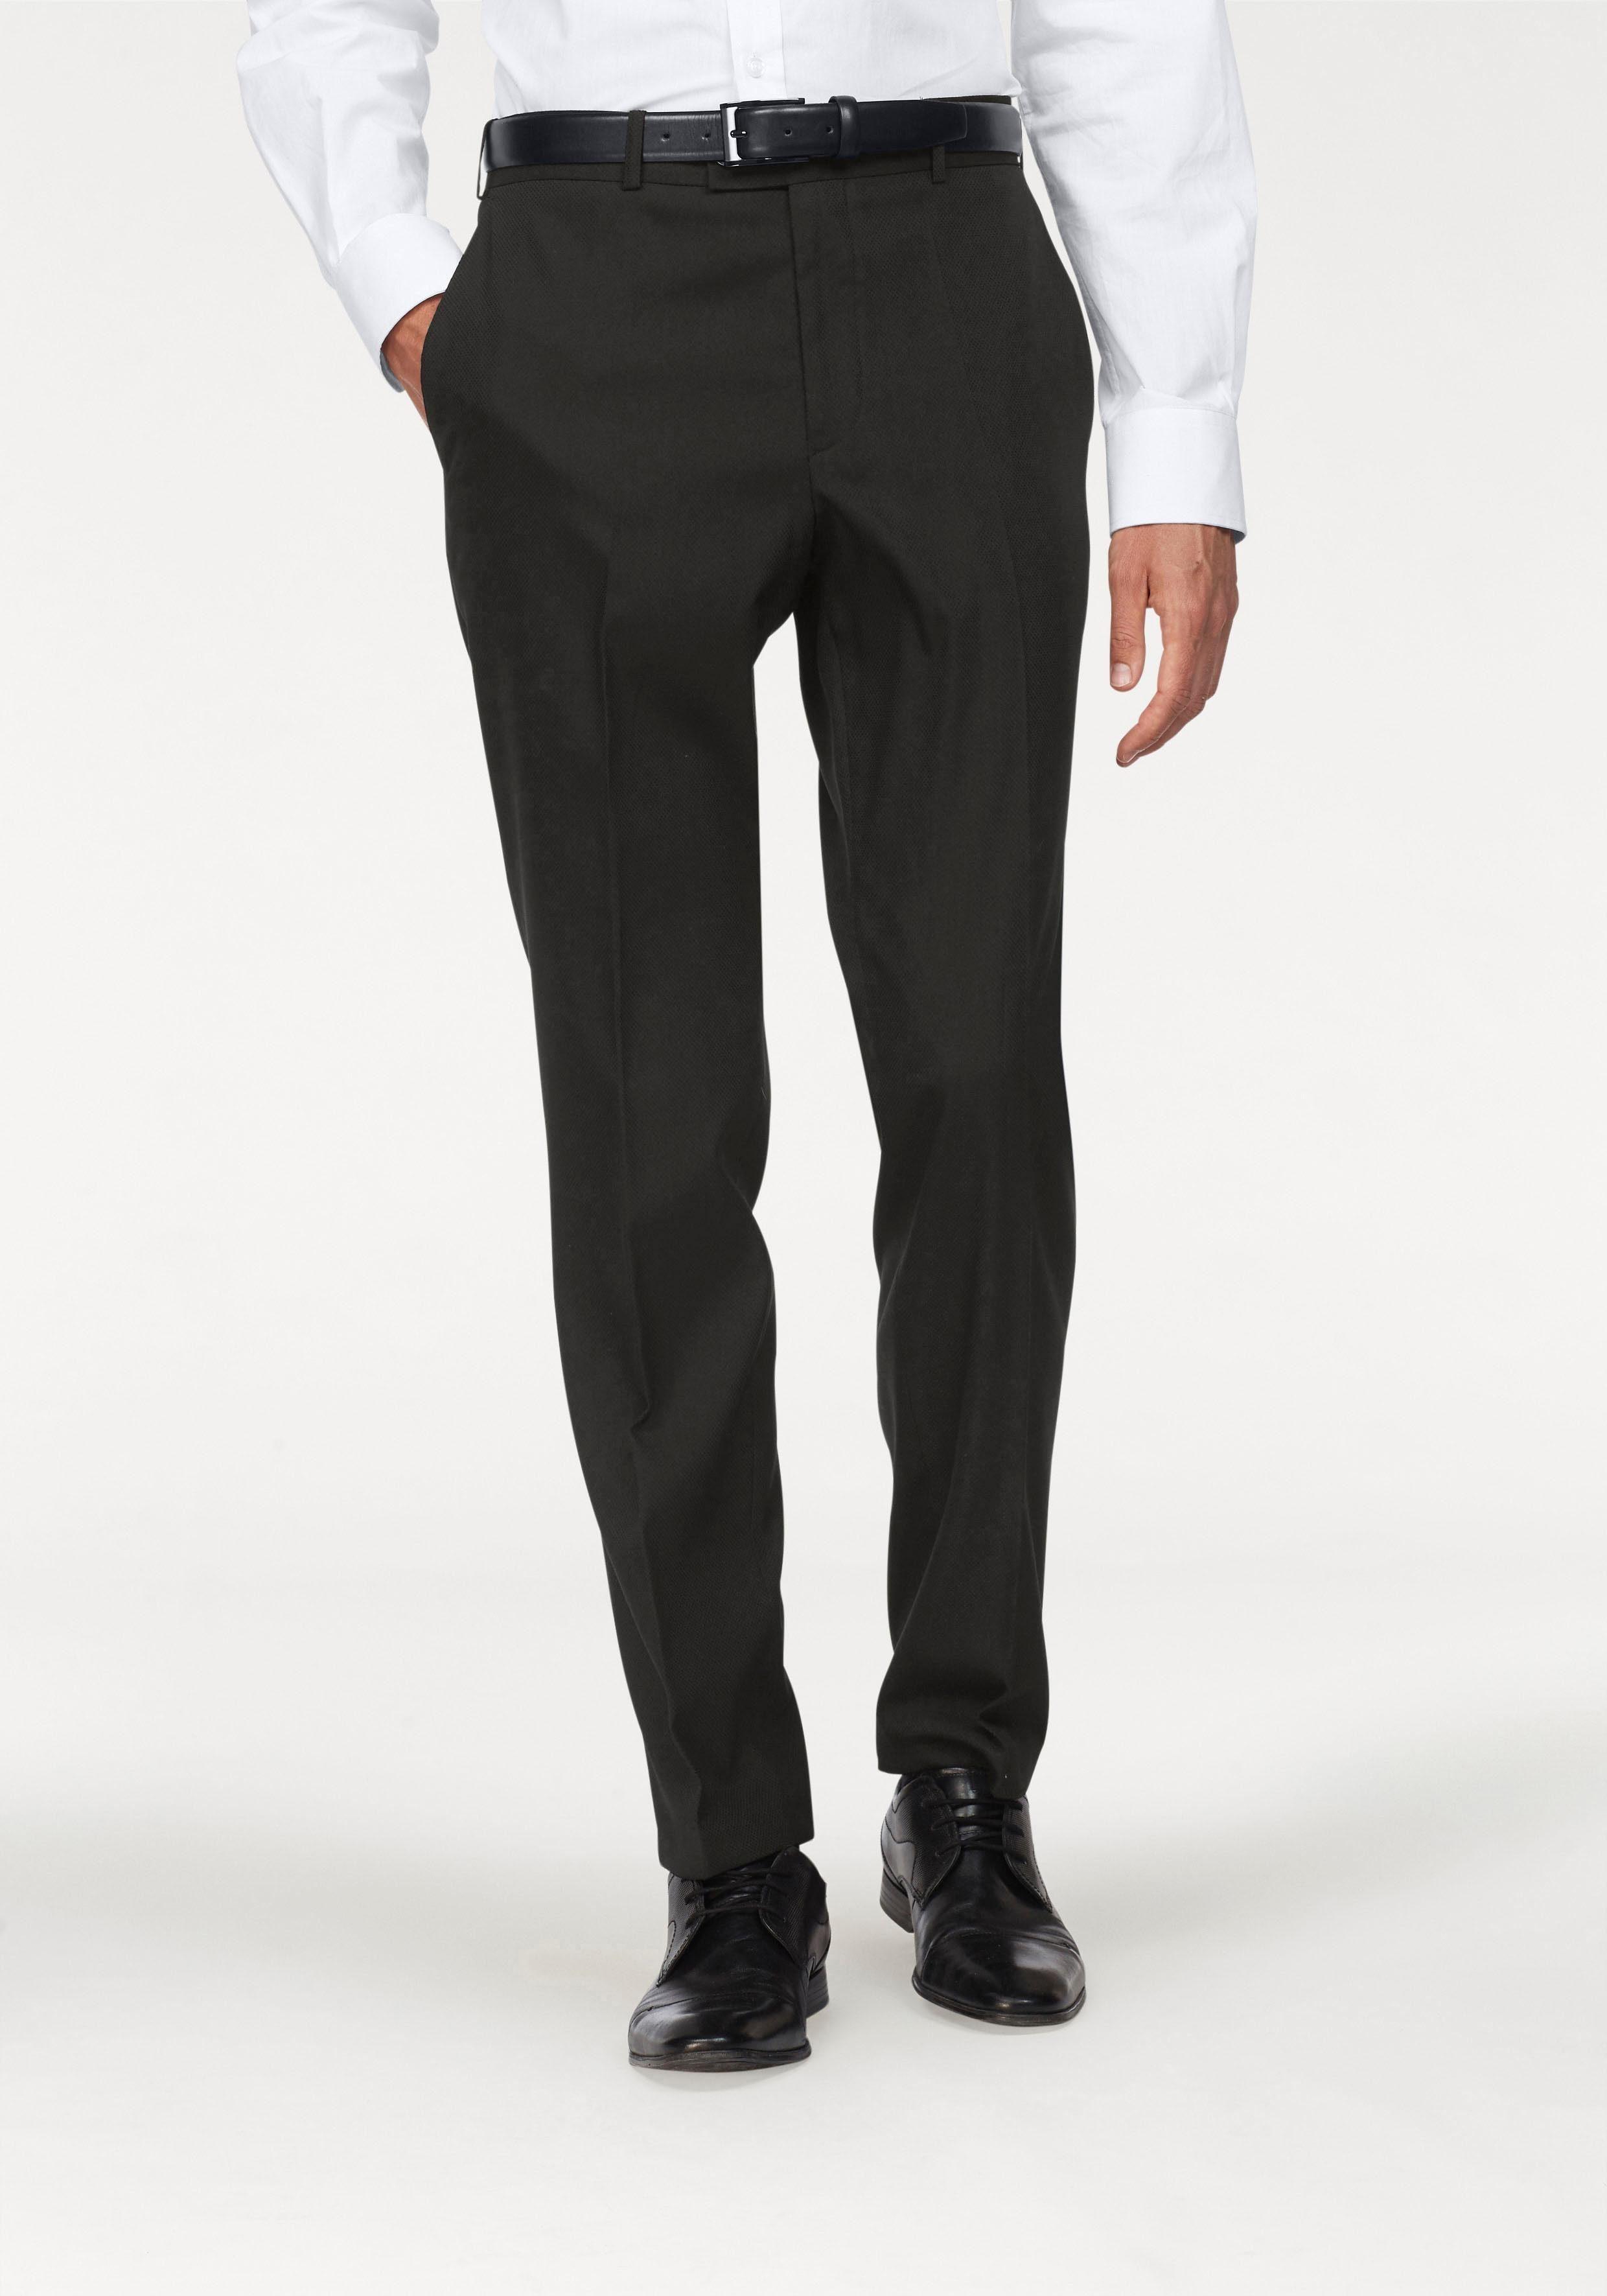 Pantalon online kopen? Shop een pantalon hier | OTTO